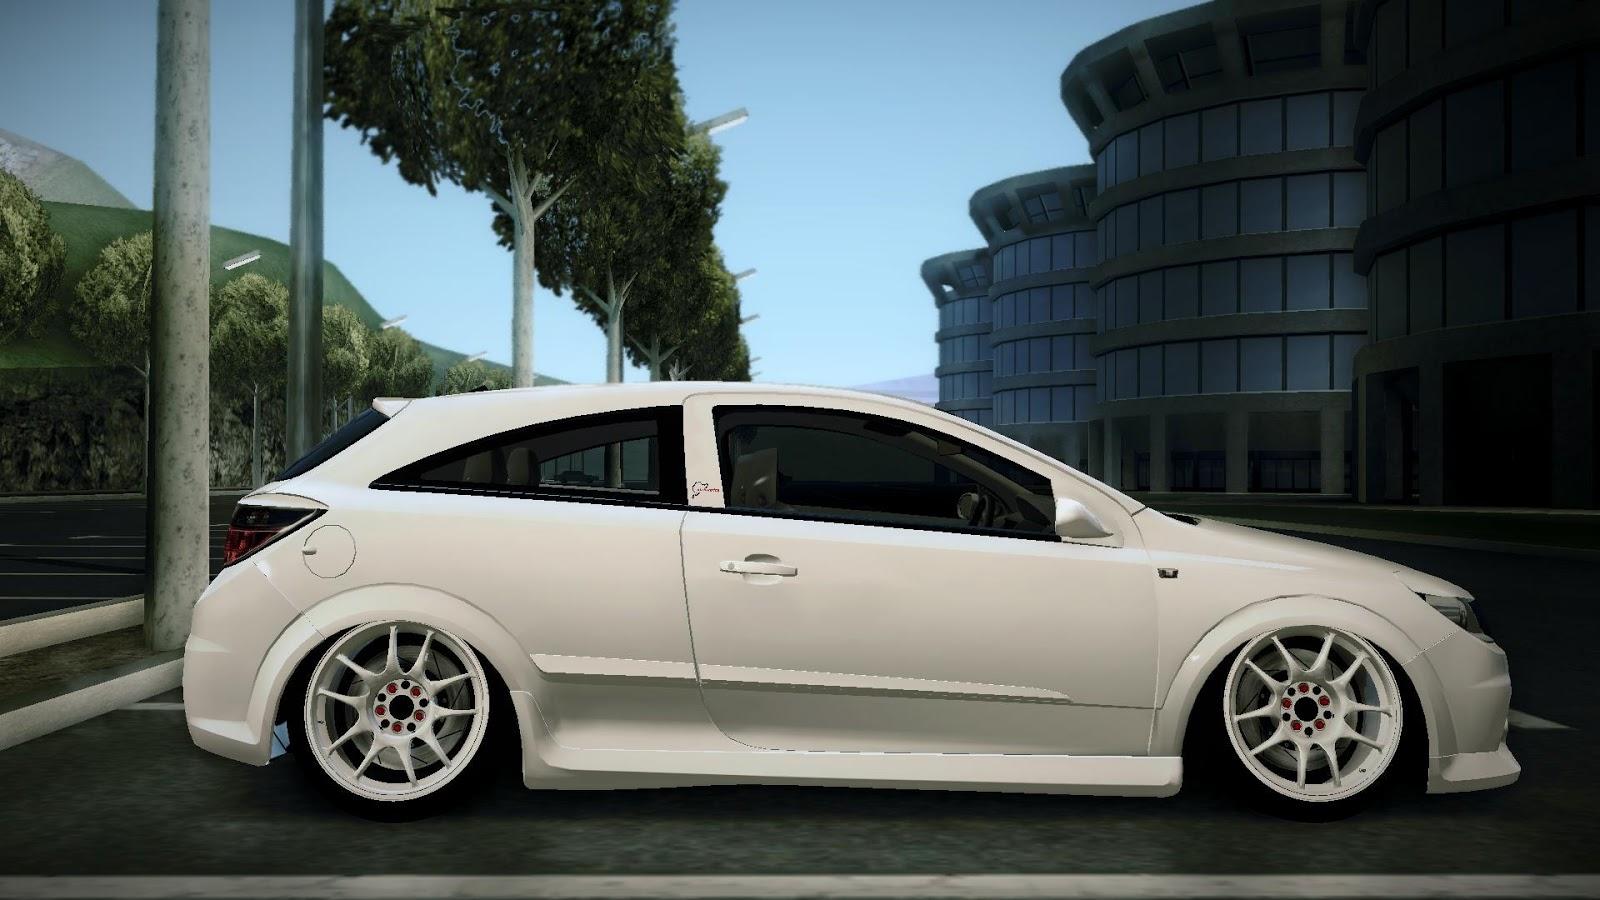 Autos Media: Vauxhall Astra VXR Stance